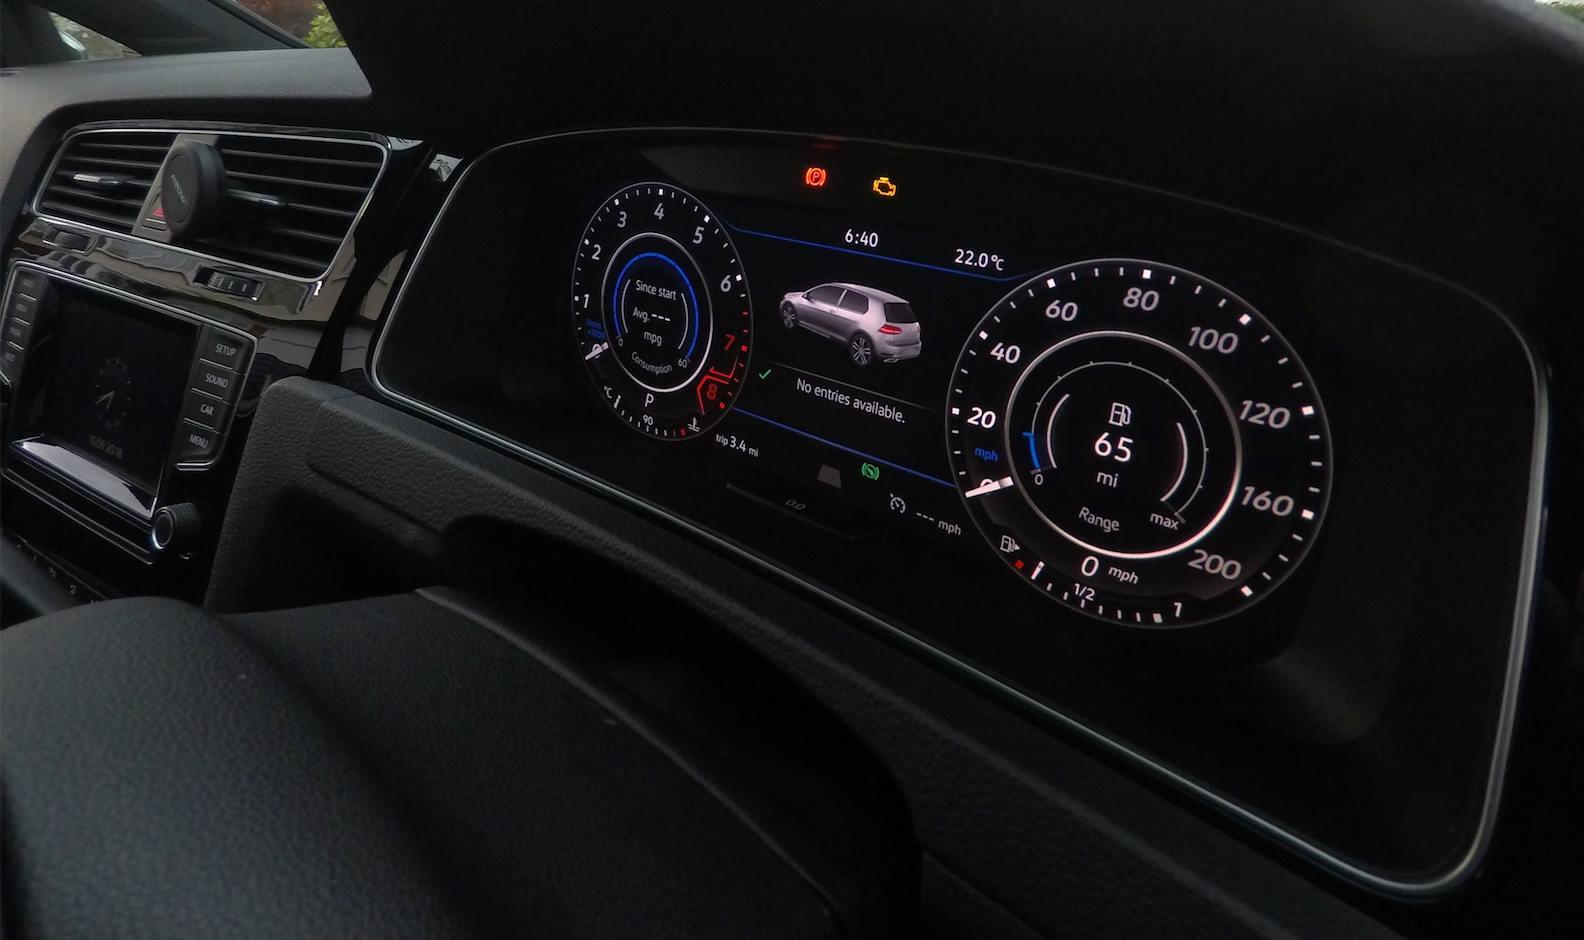 Vagwerkes | Vagwerkes, Diagnostics experts in all VW, Audi